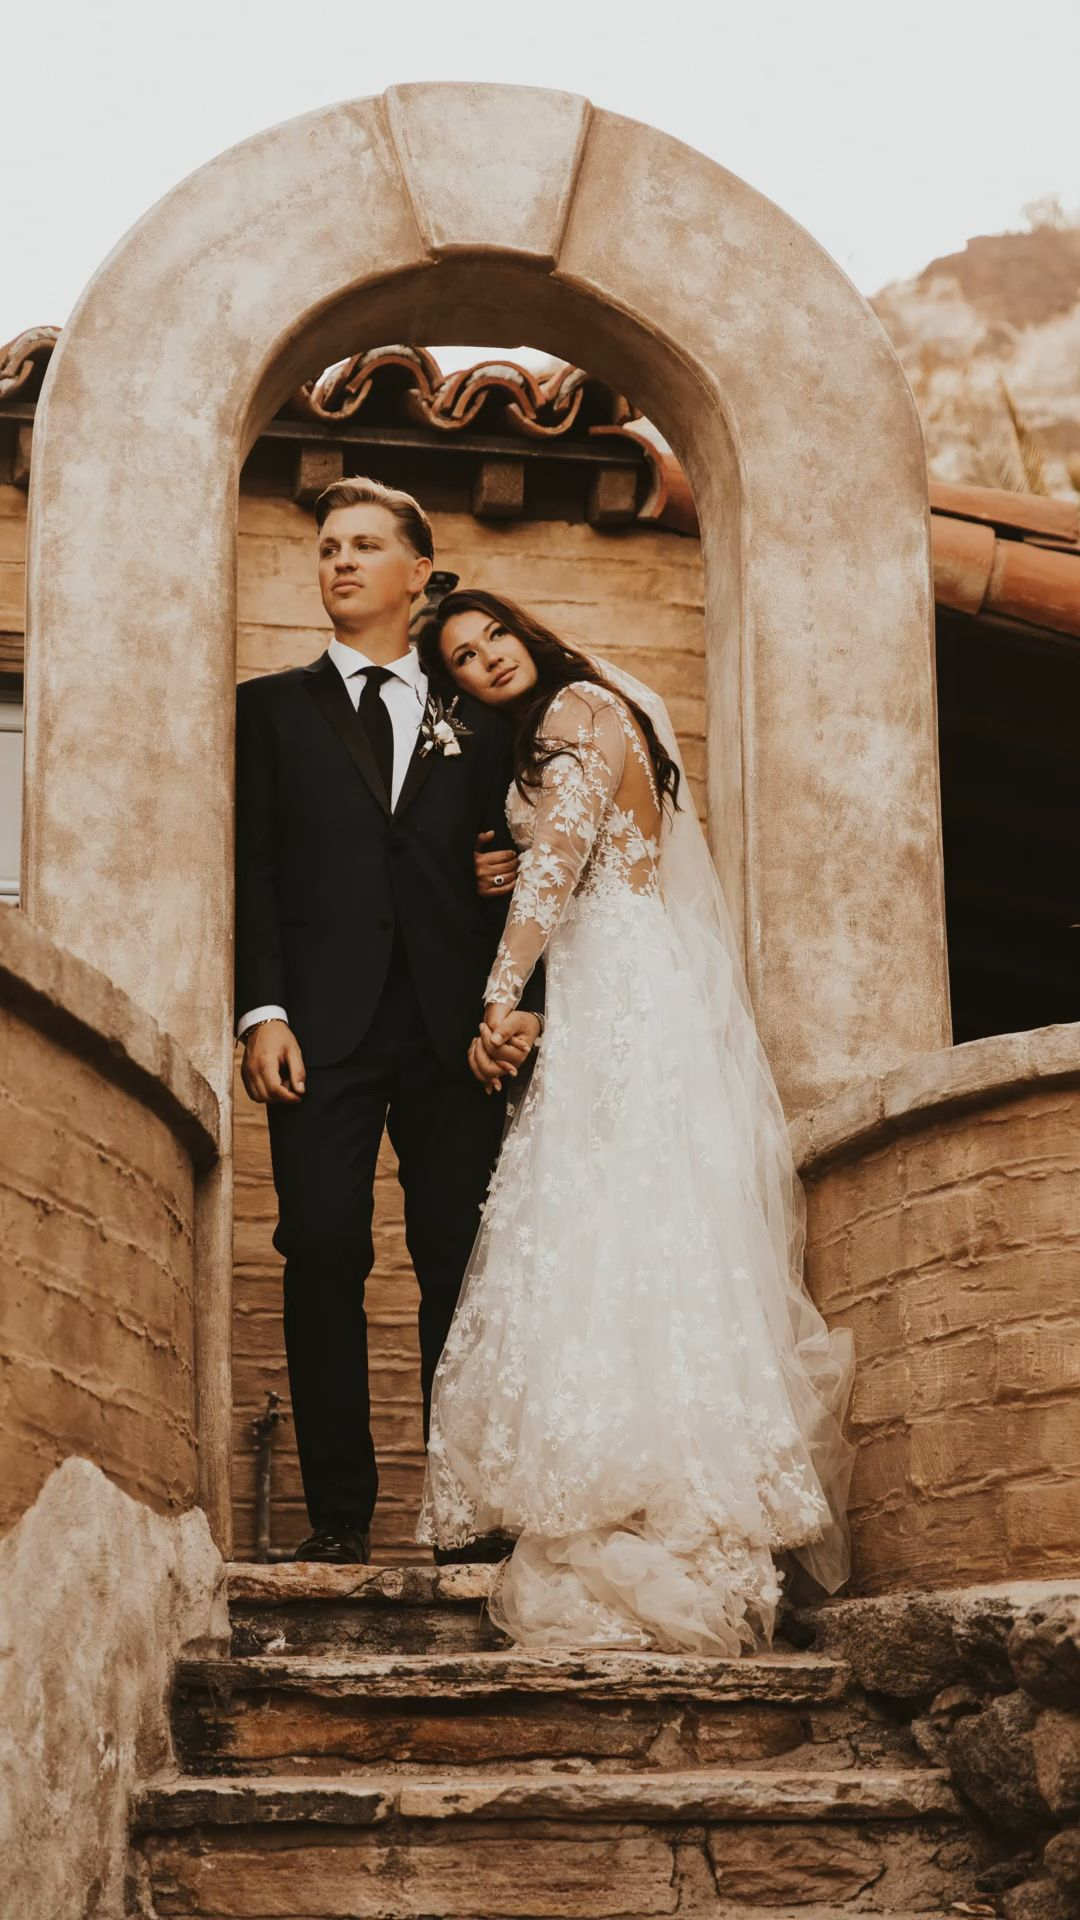 Bride and groom photos Palm Springs wedding